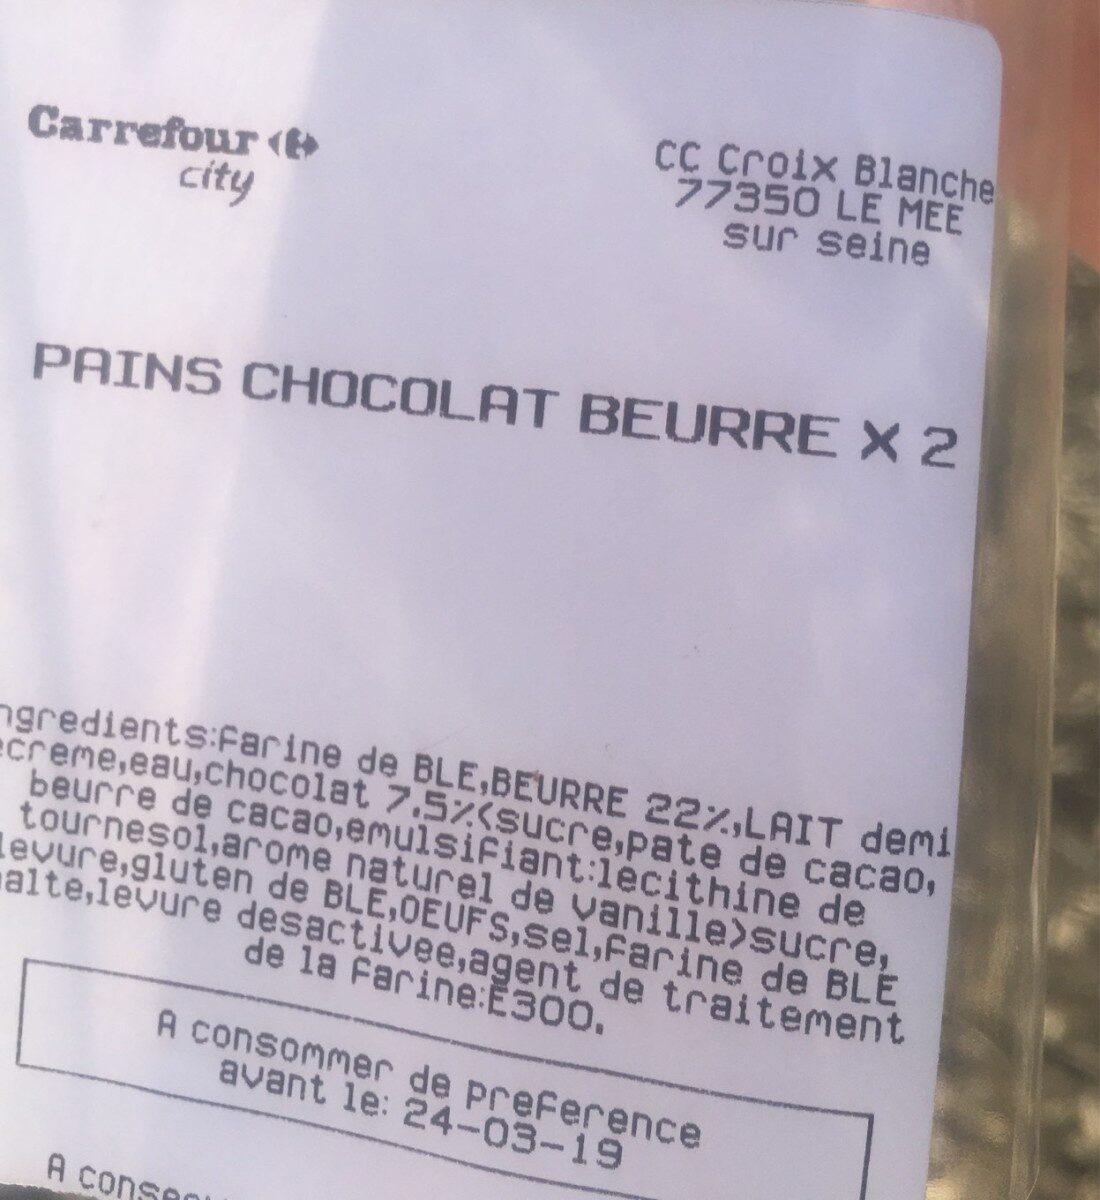 Pain chocolat beurre x2 - Product - fr